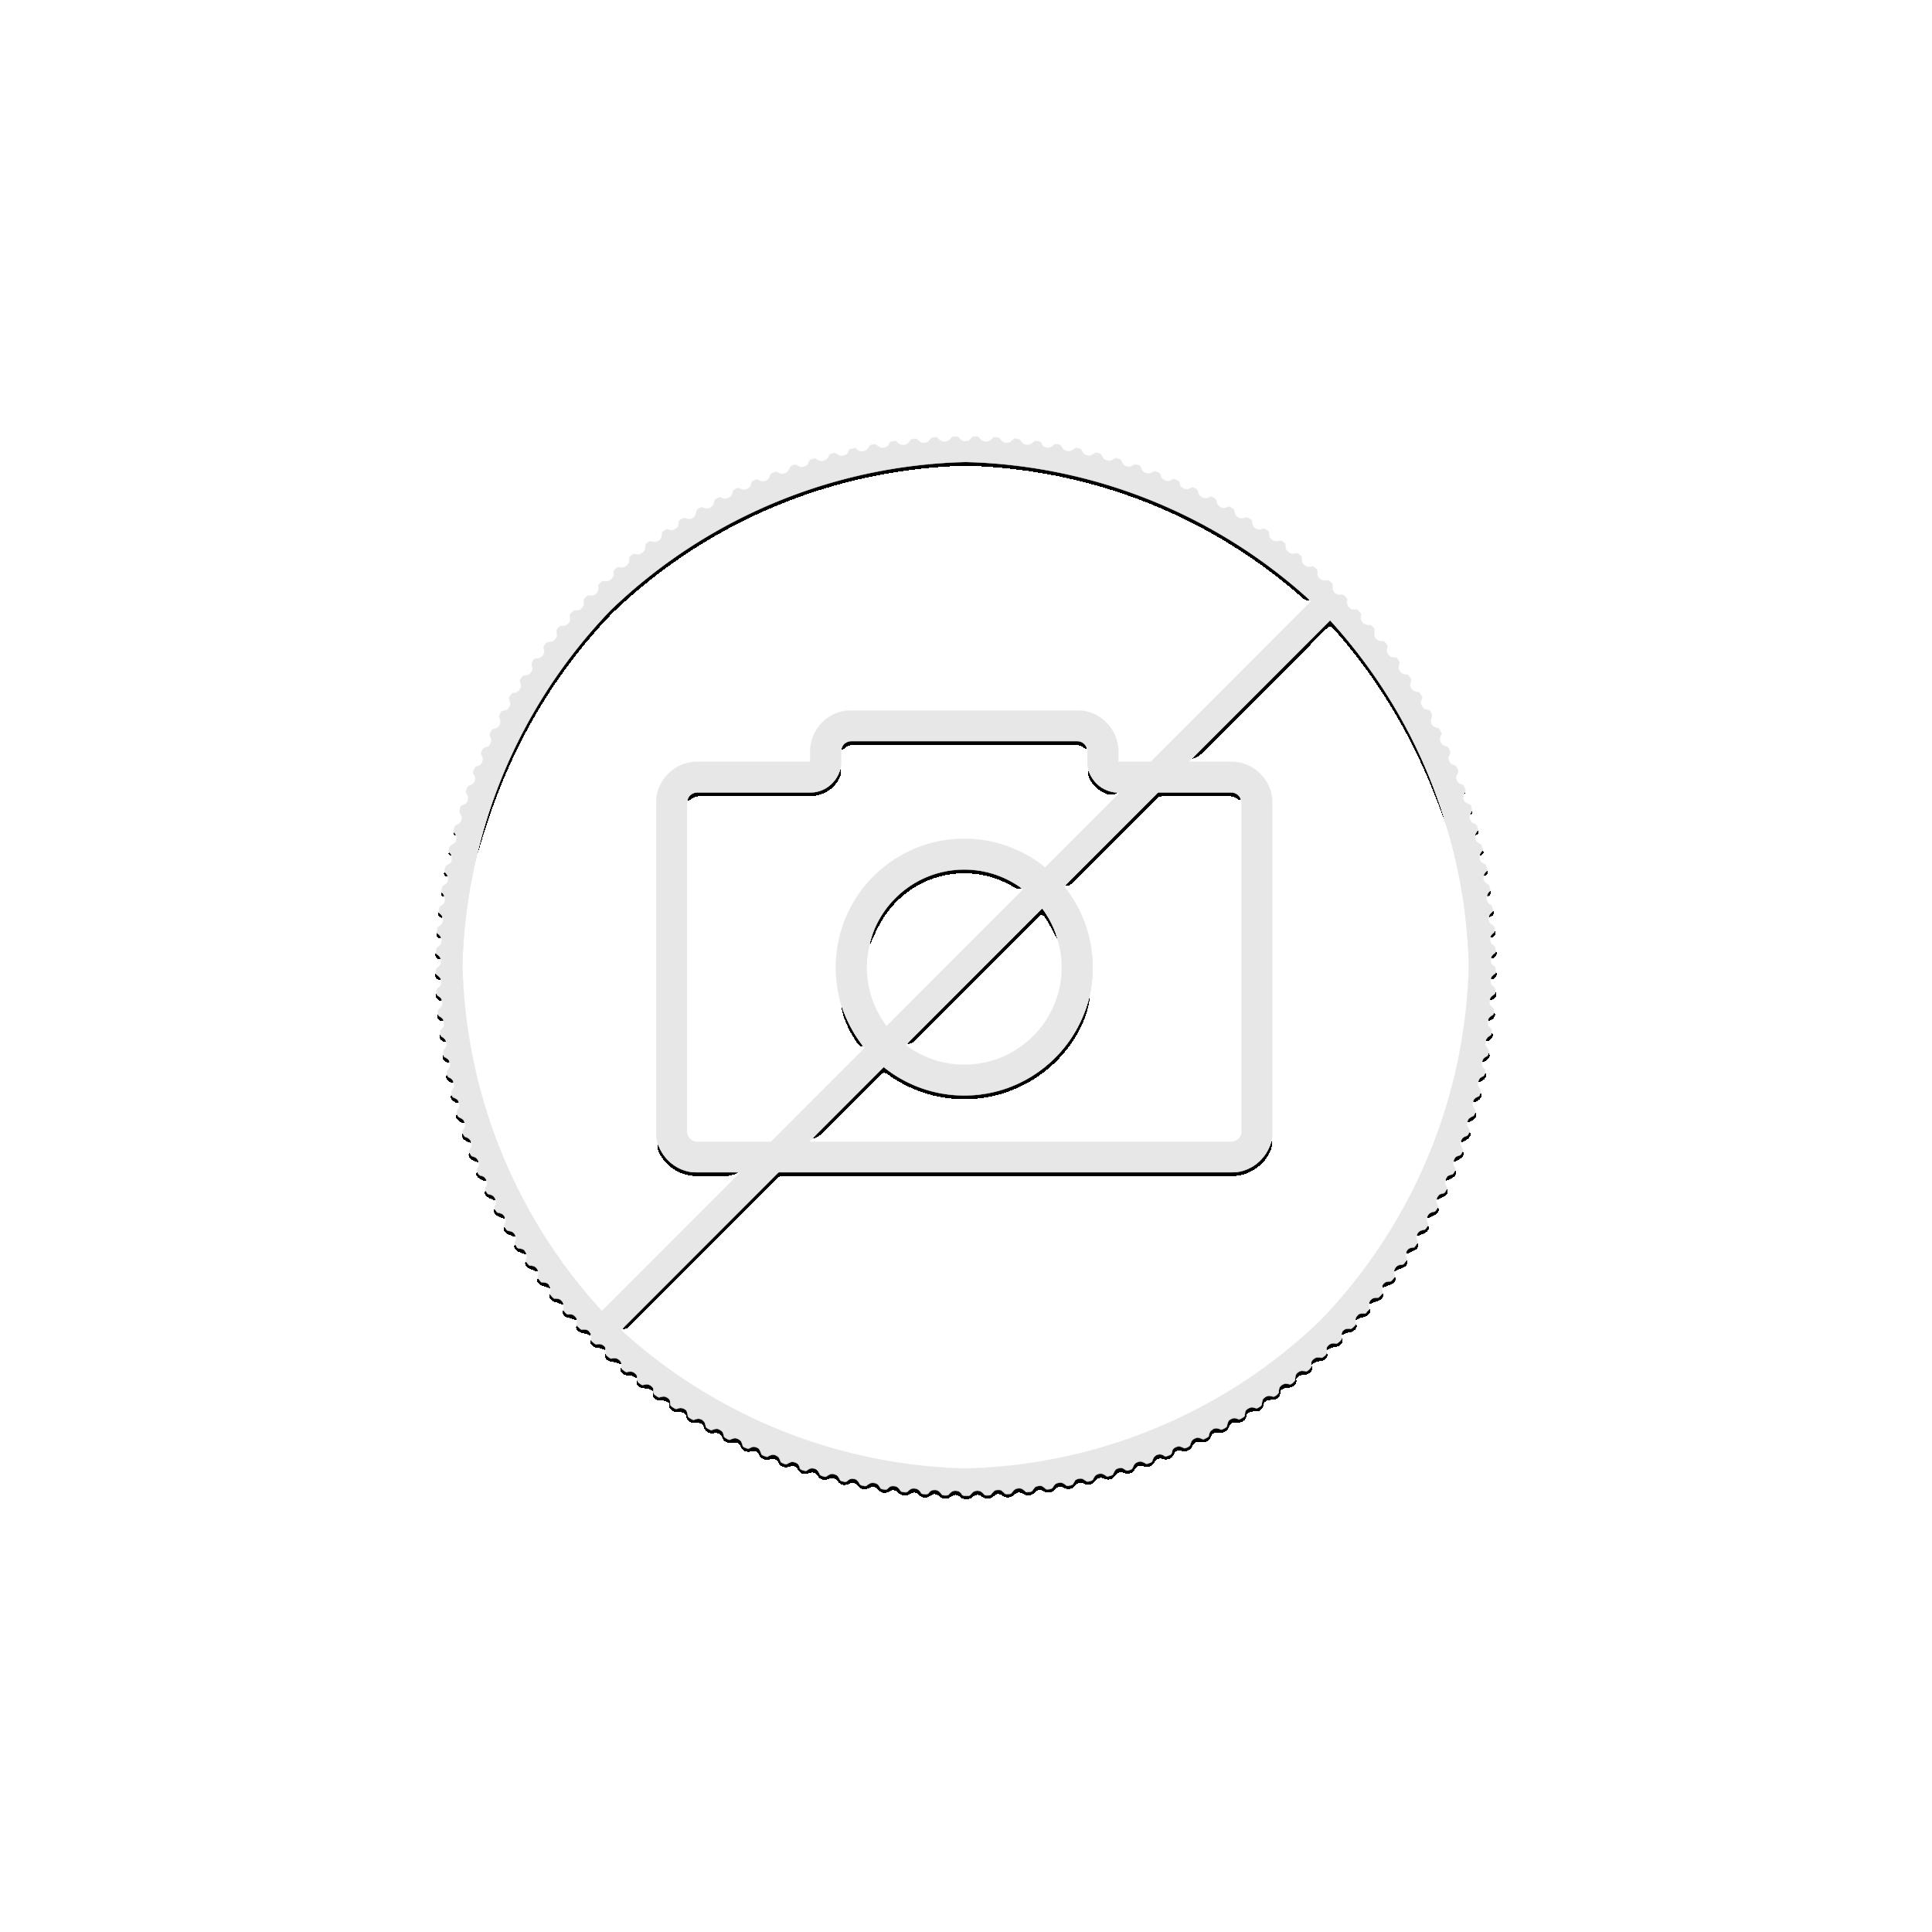 1 Troy ounce platina Wiener Philharmoniker munt 2019